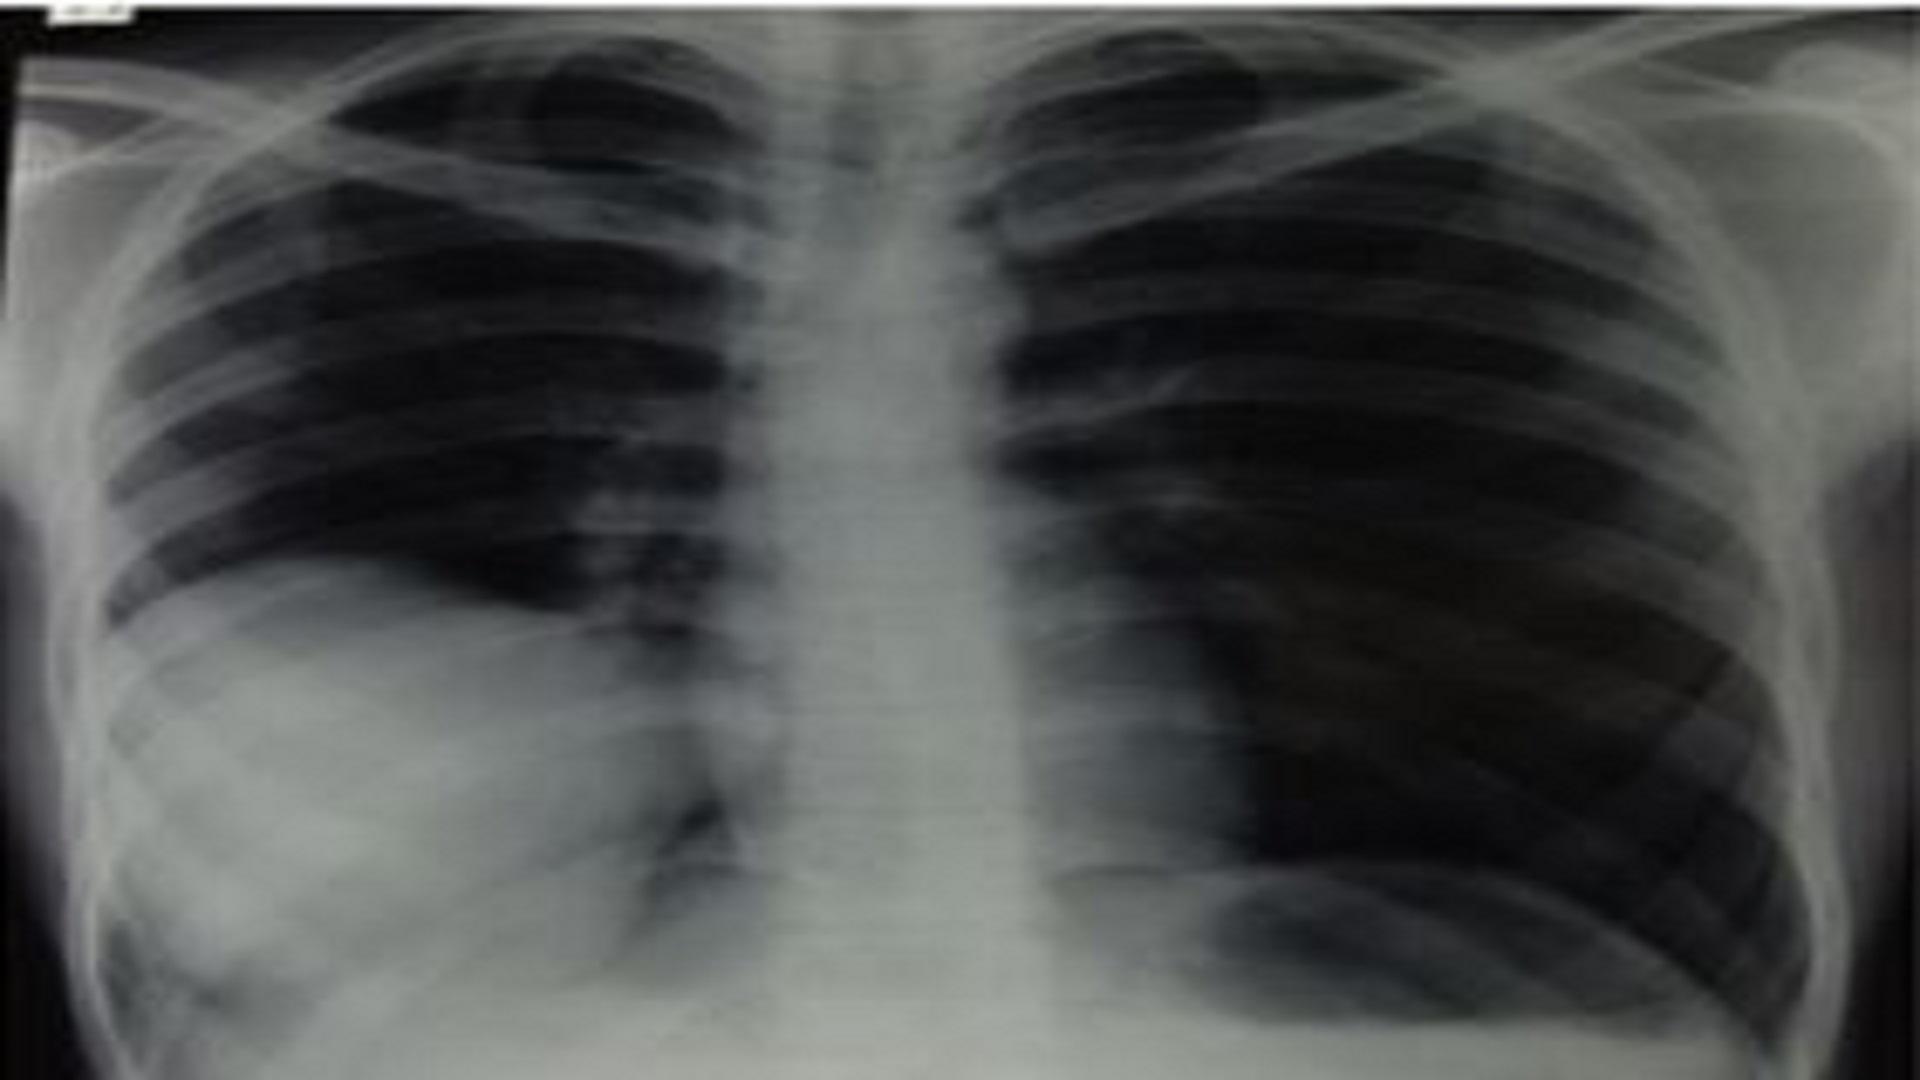 Primary Pulmonary Synovial Sarcoma- A Case Report